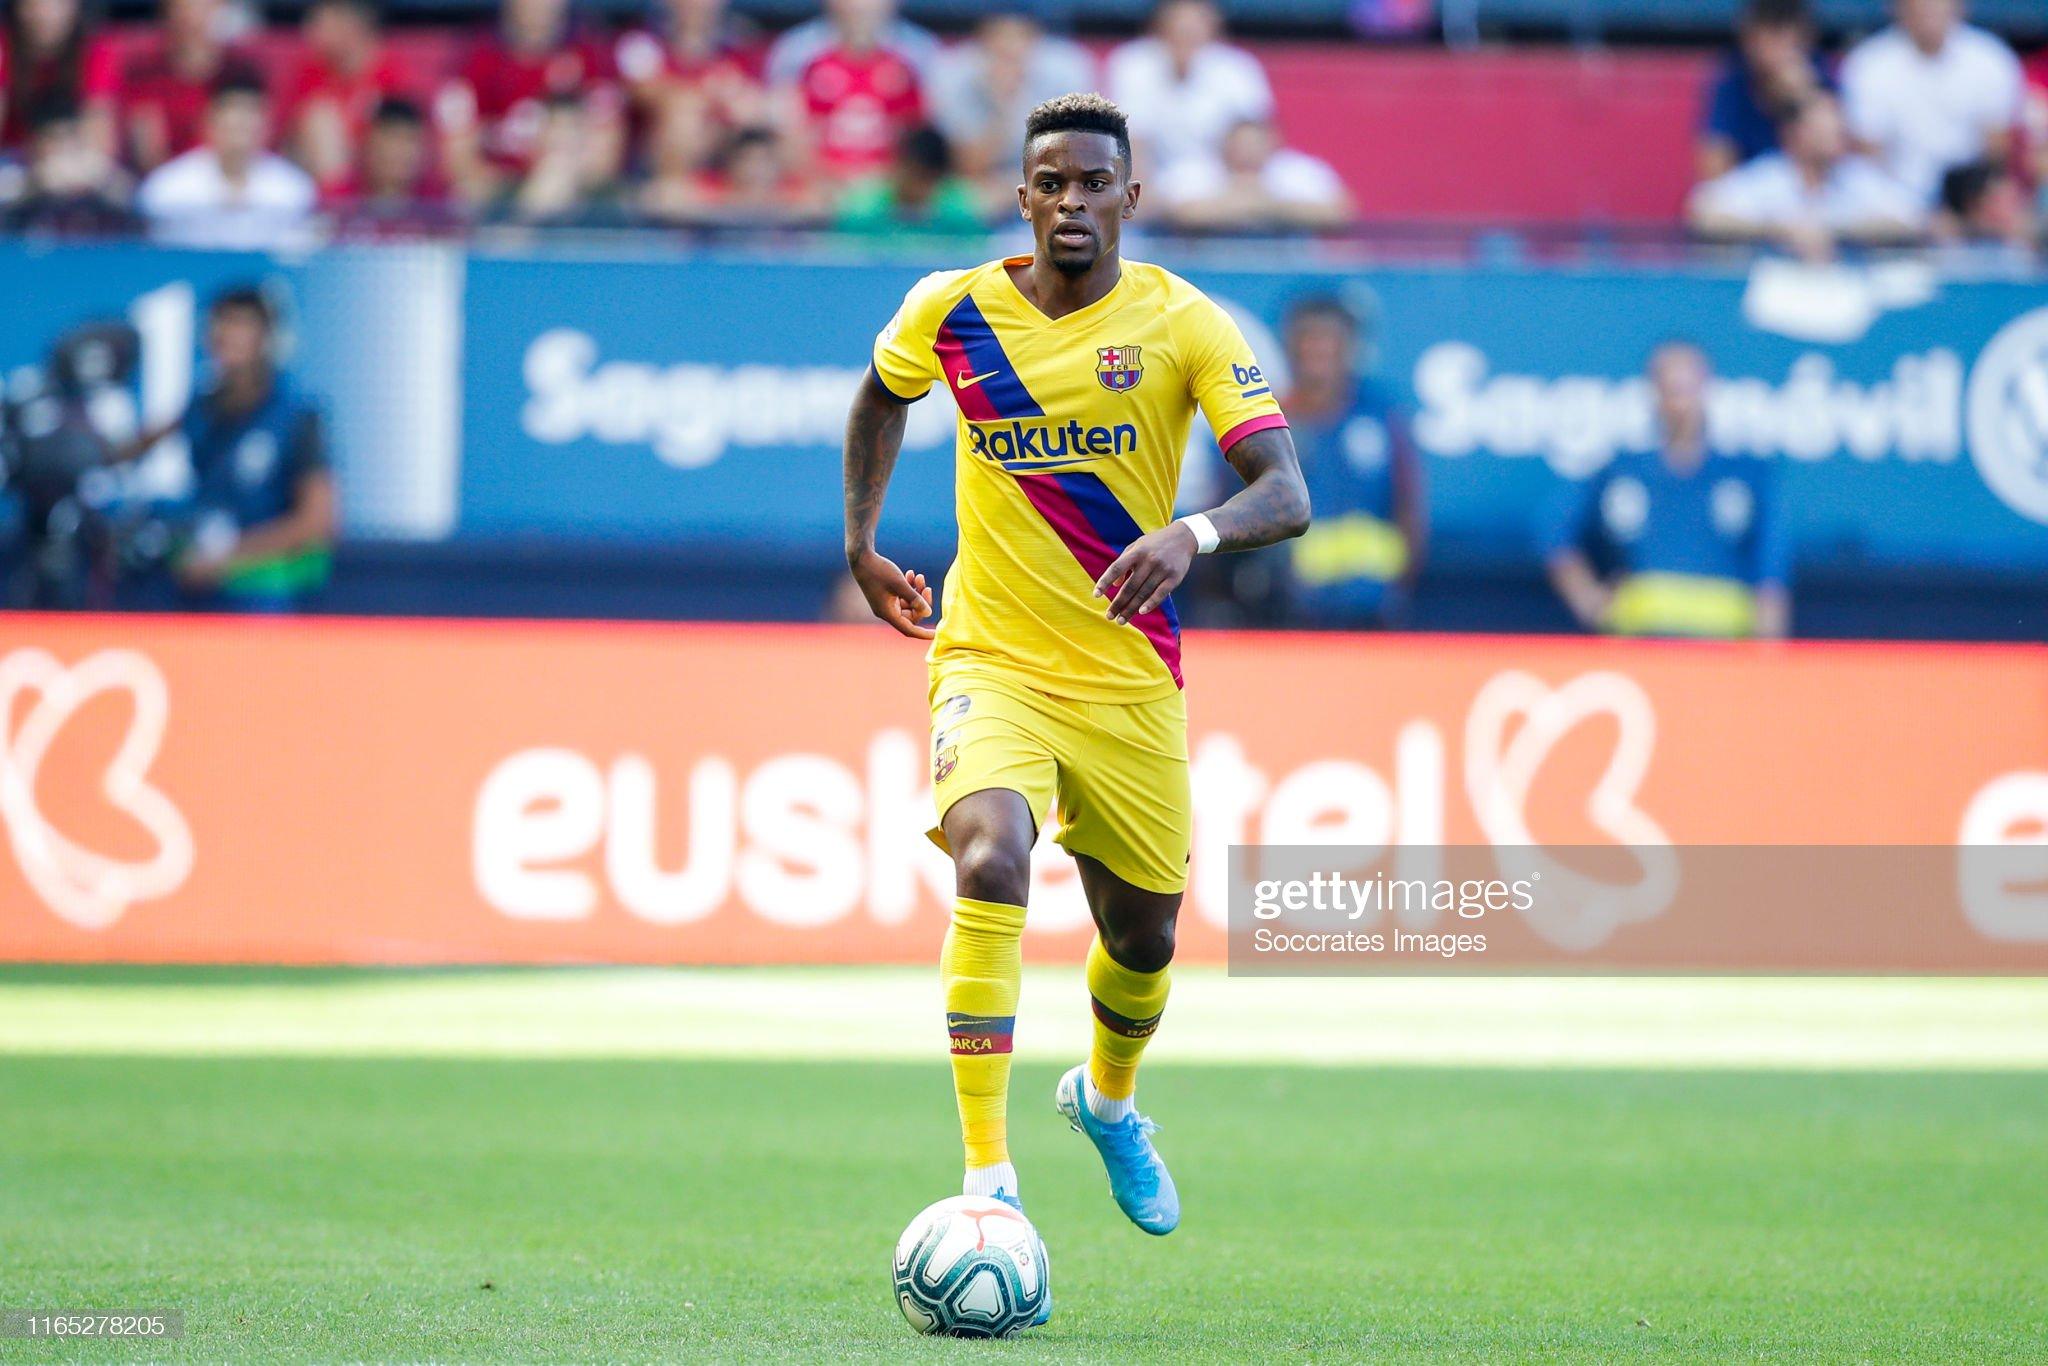 صور مباراة : أوساسونا - برشلونة 2-2 ( 31-08-2019 )  Nelson-semedo-of-fc-barcelona-during-the-la-liga-santander-match-v-picture-id1165278205?s=2048x2048